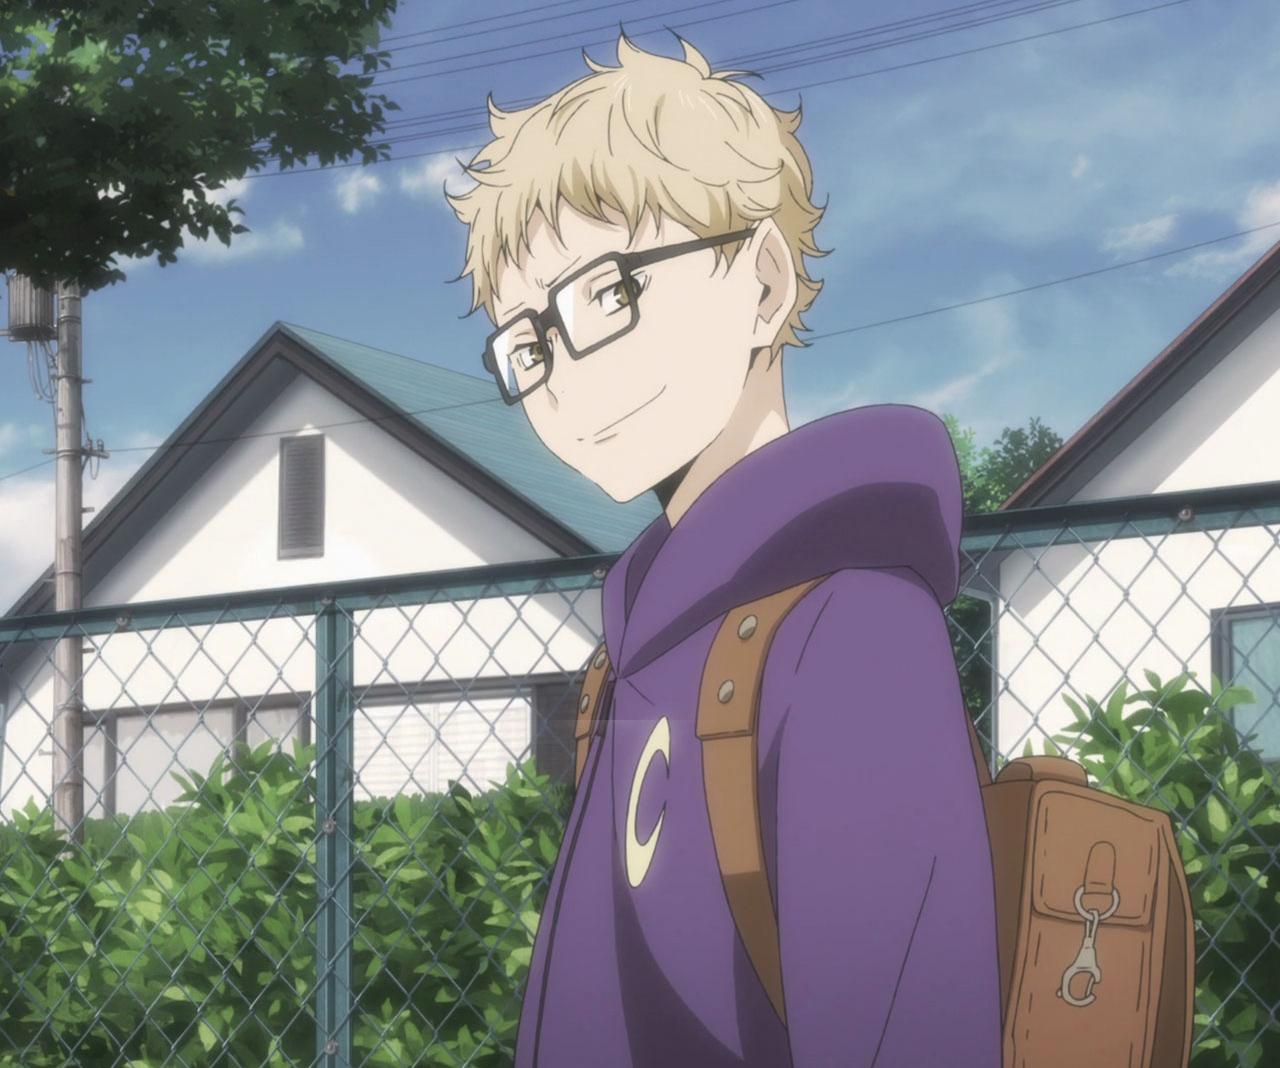 Haikyuu Manga Host: Haikyuu!! Second Season - 08